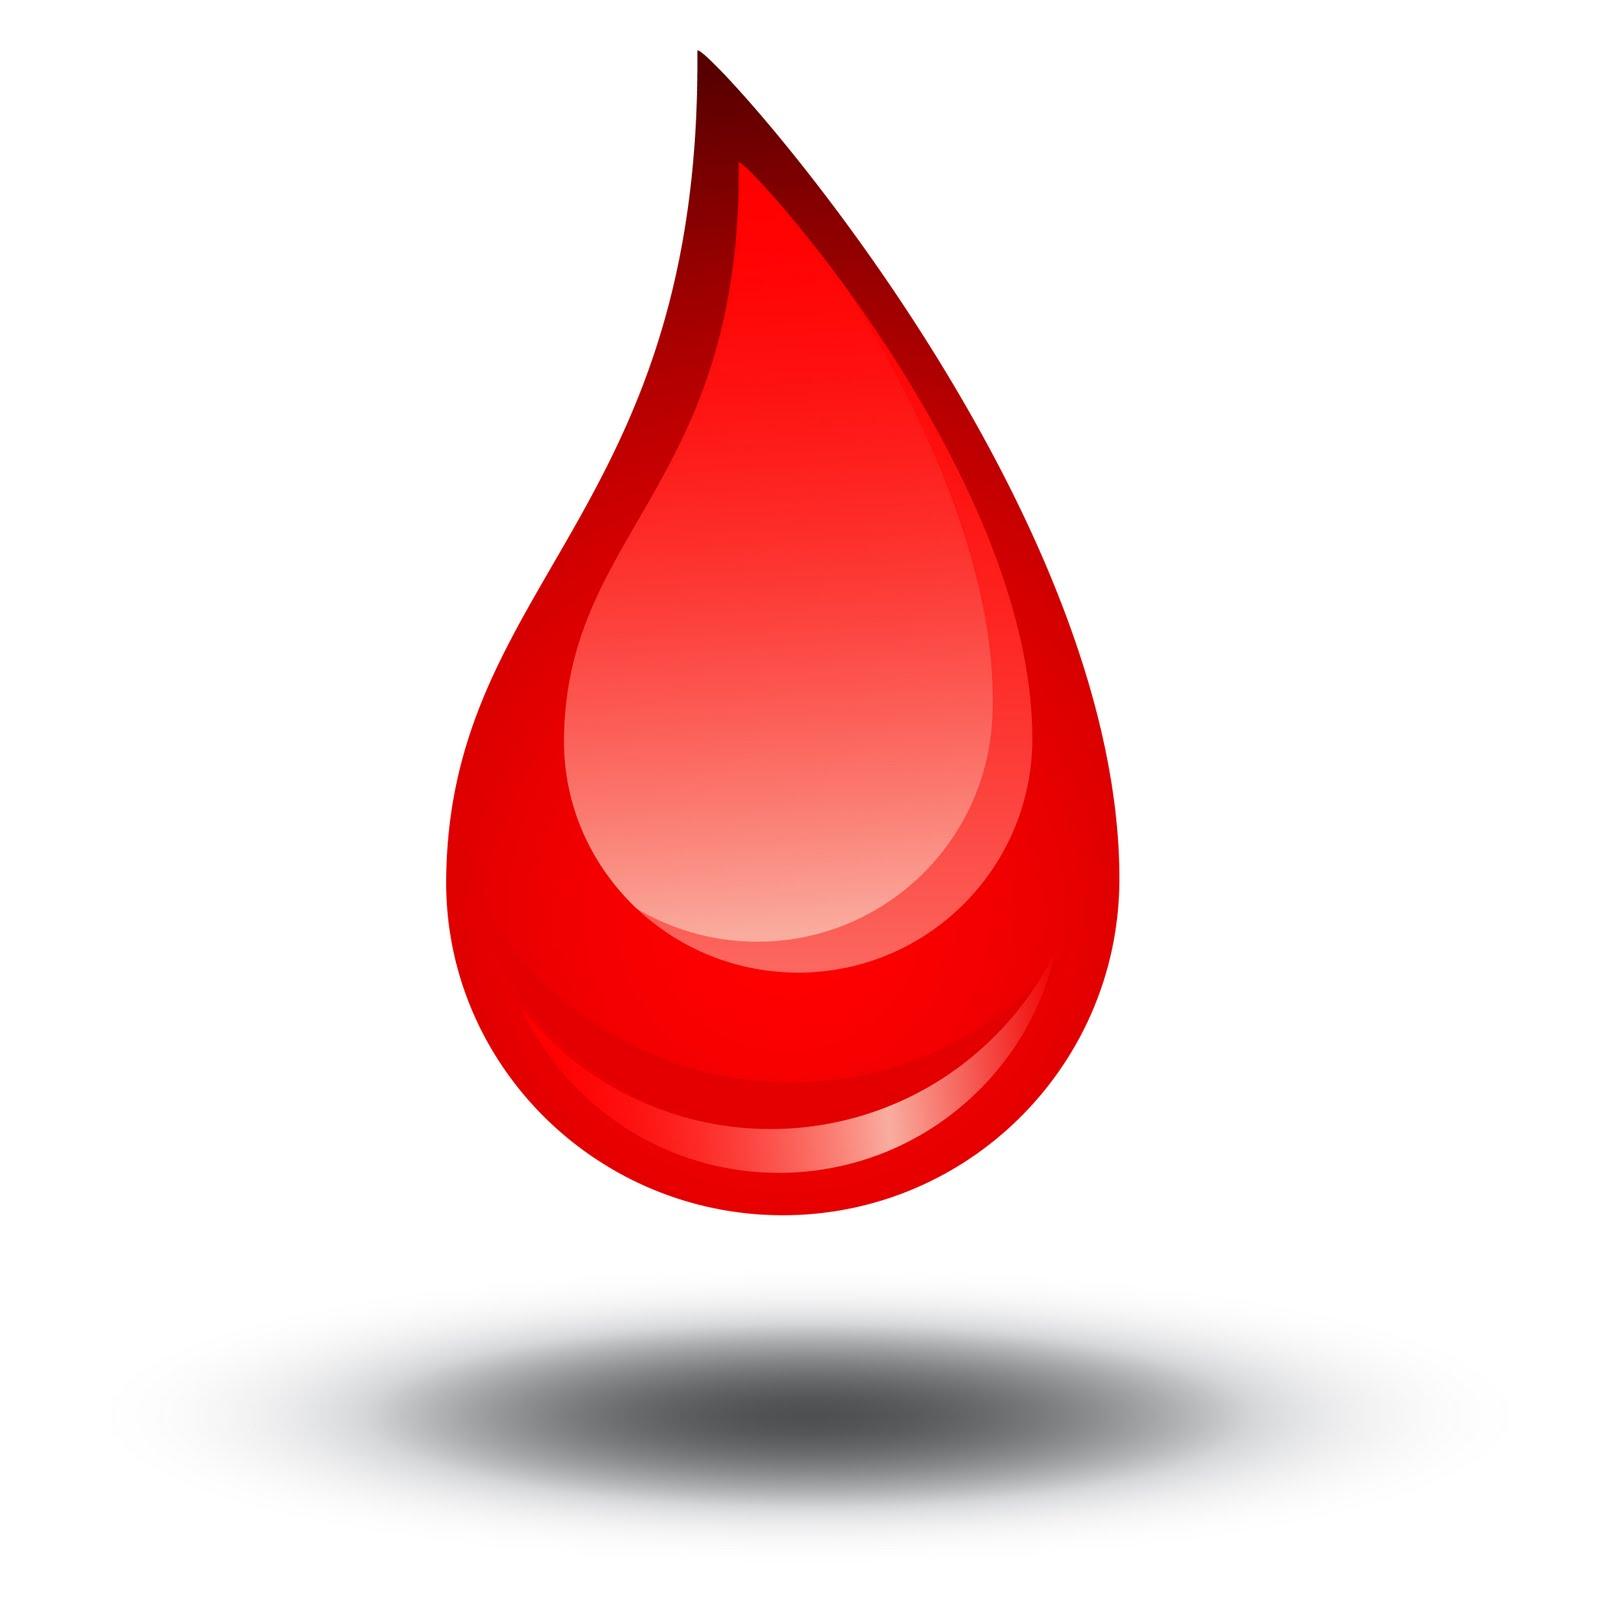 Blood clipart emoji. Mobile transfusion units financial